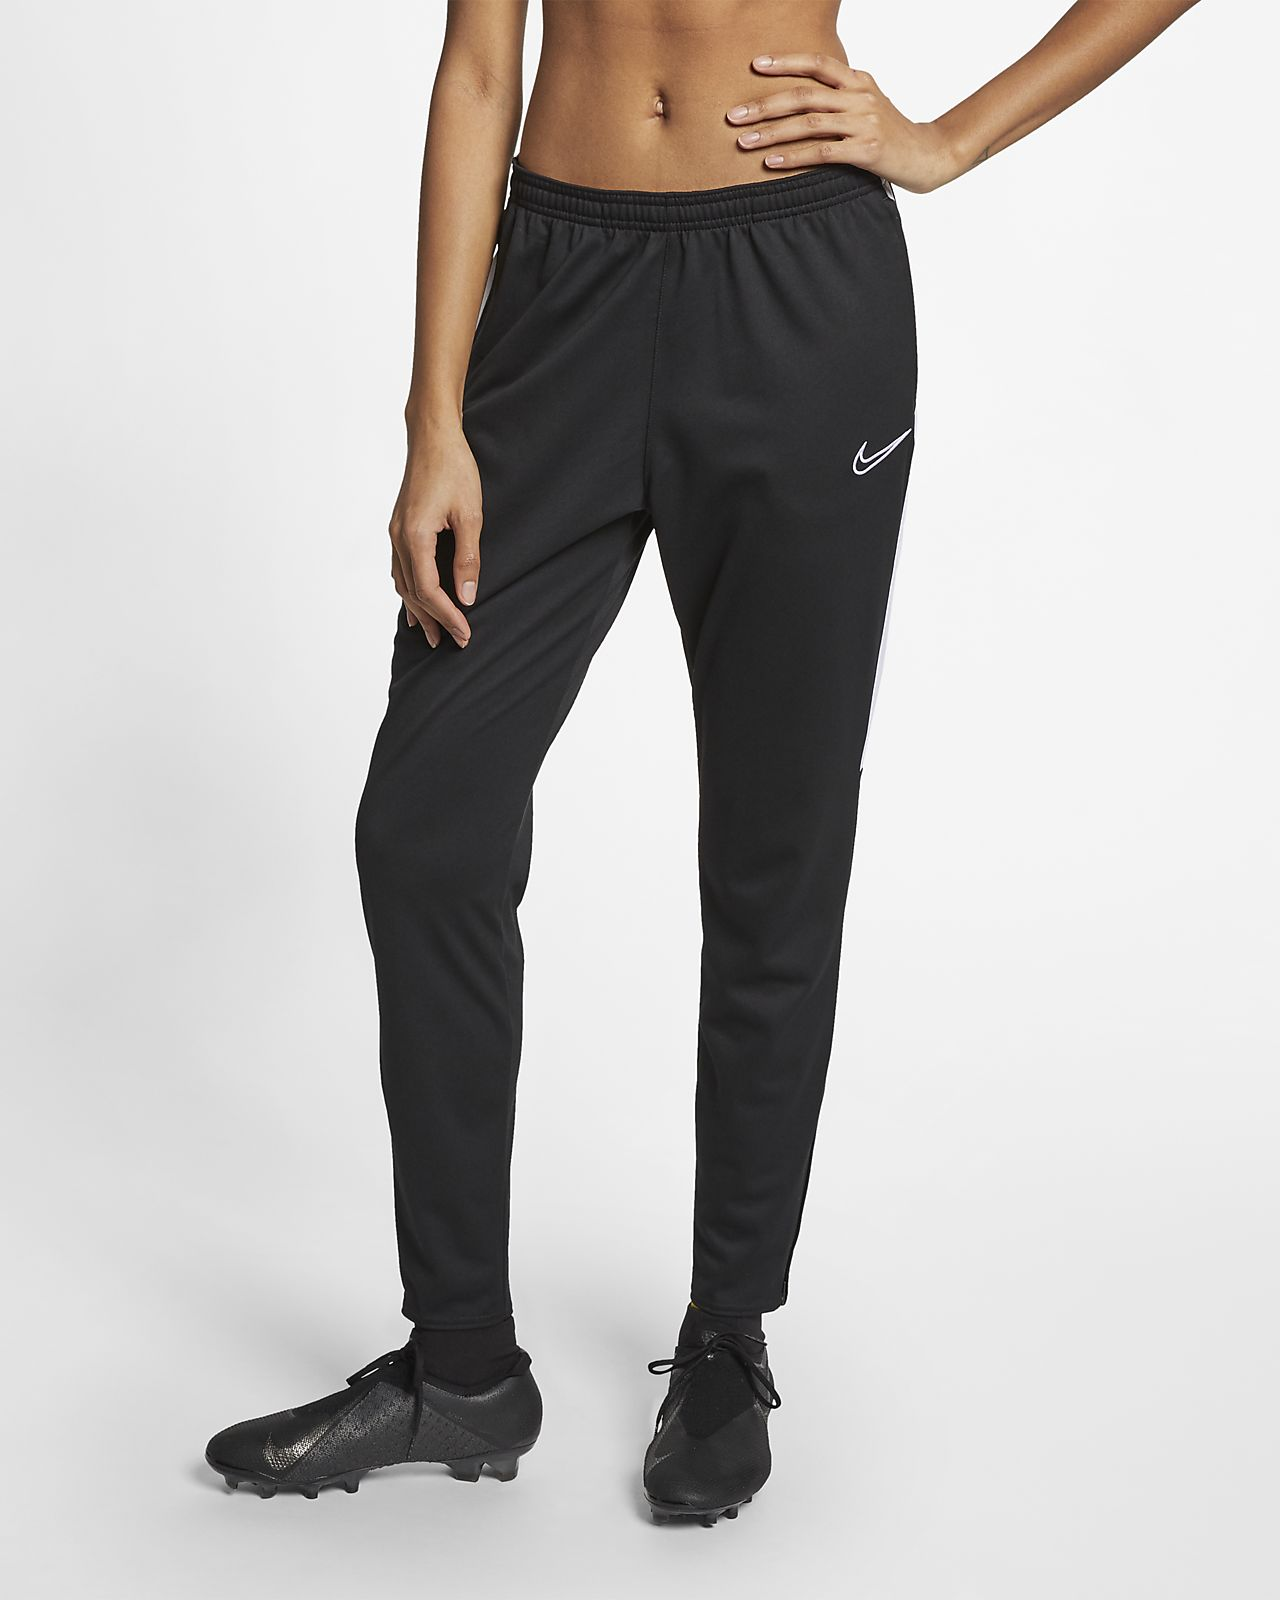 Nike Dri FIT Academy Women's Football Trousers